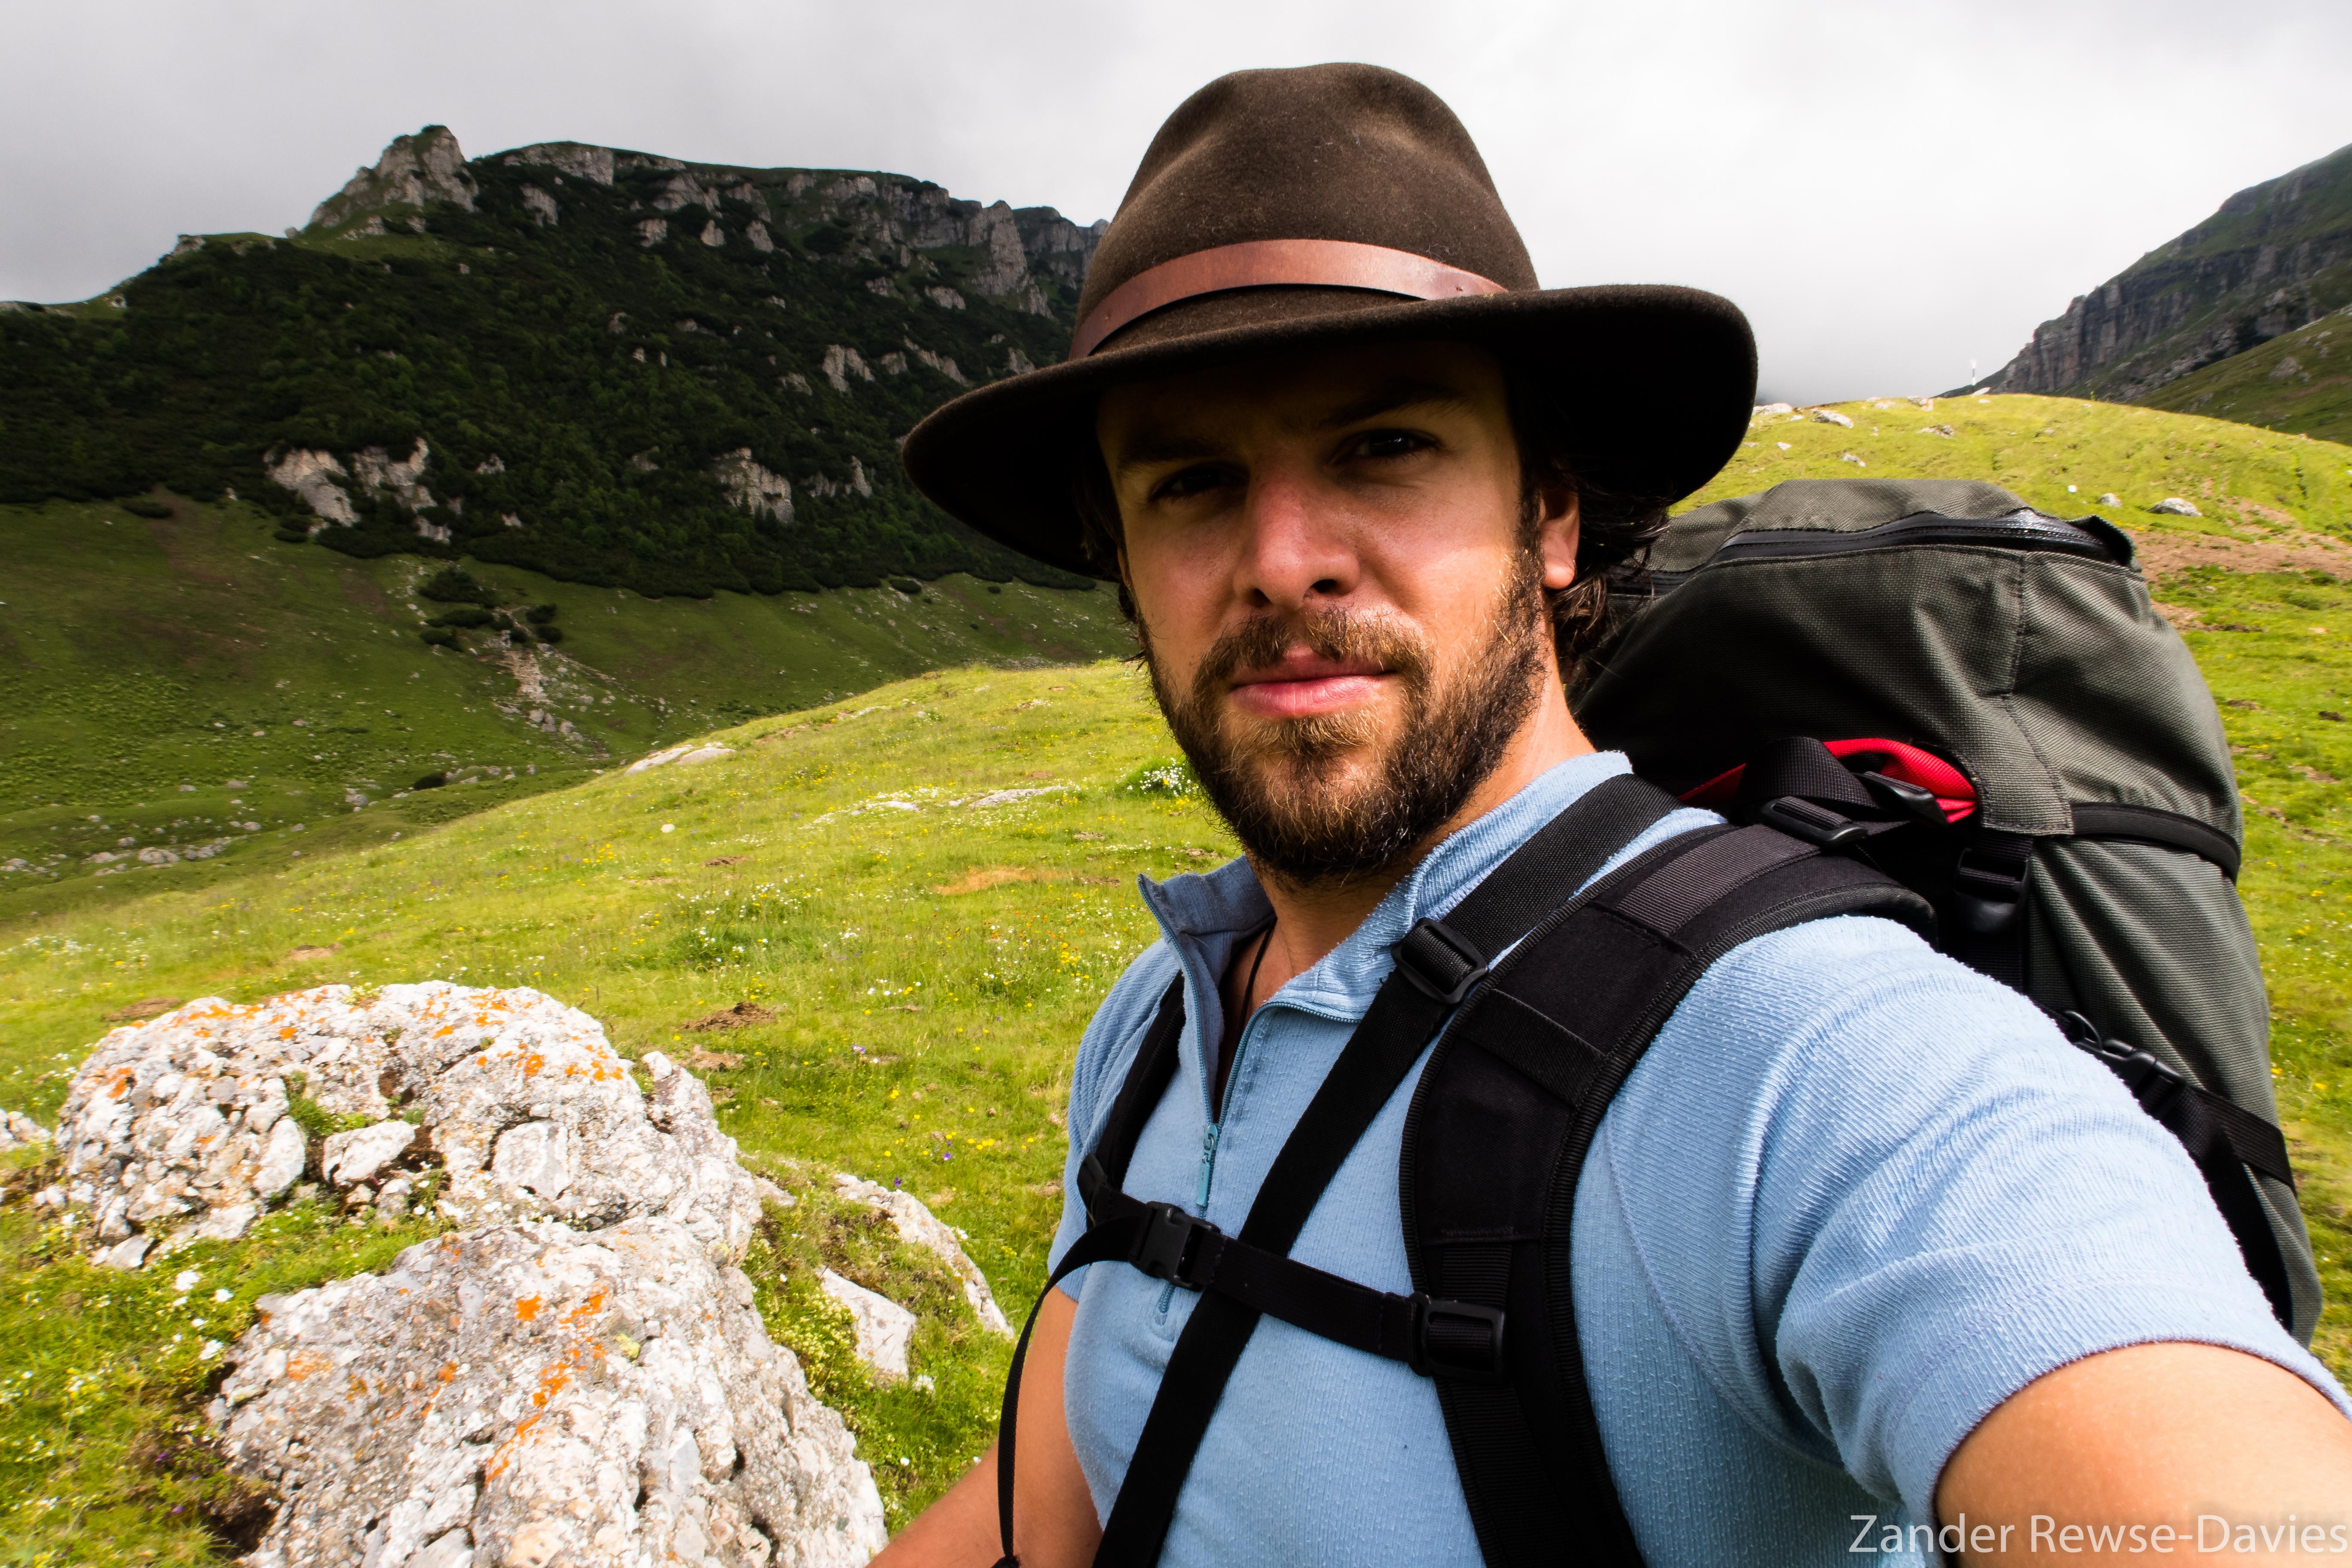 Zander exploring in Romania